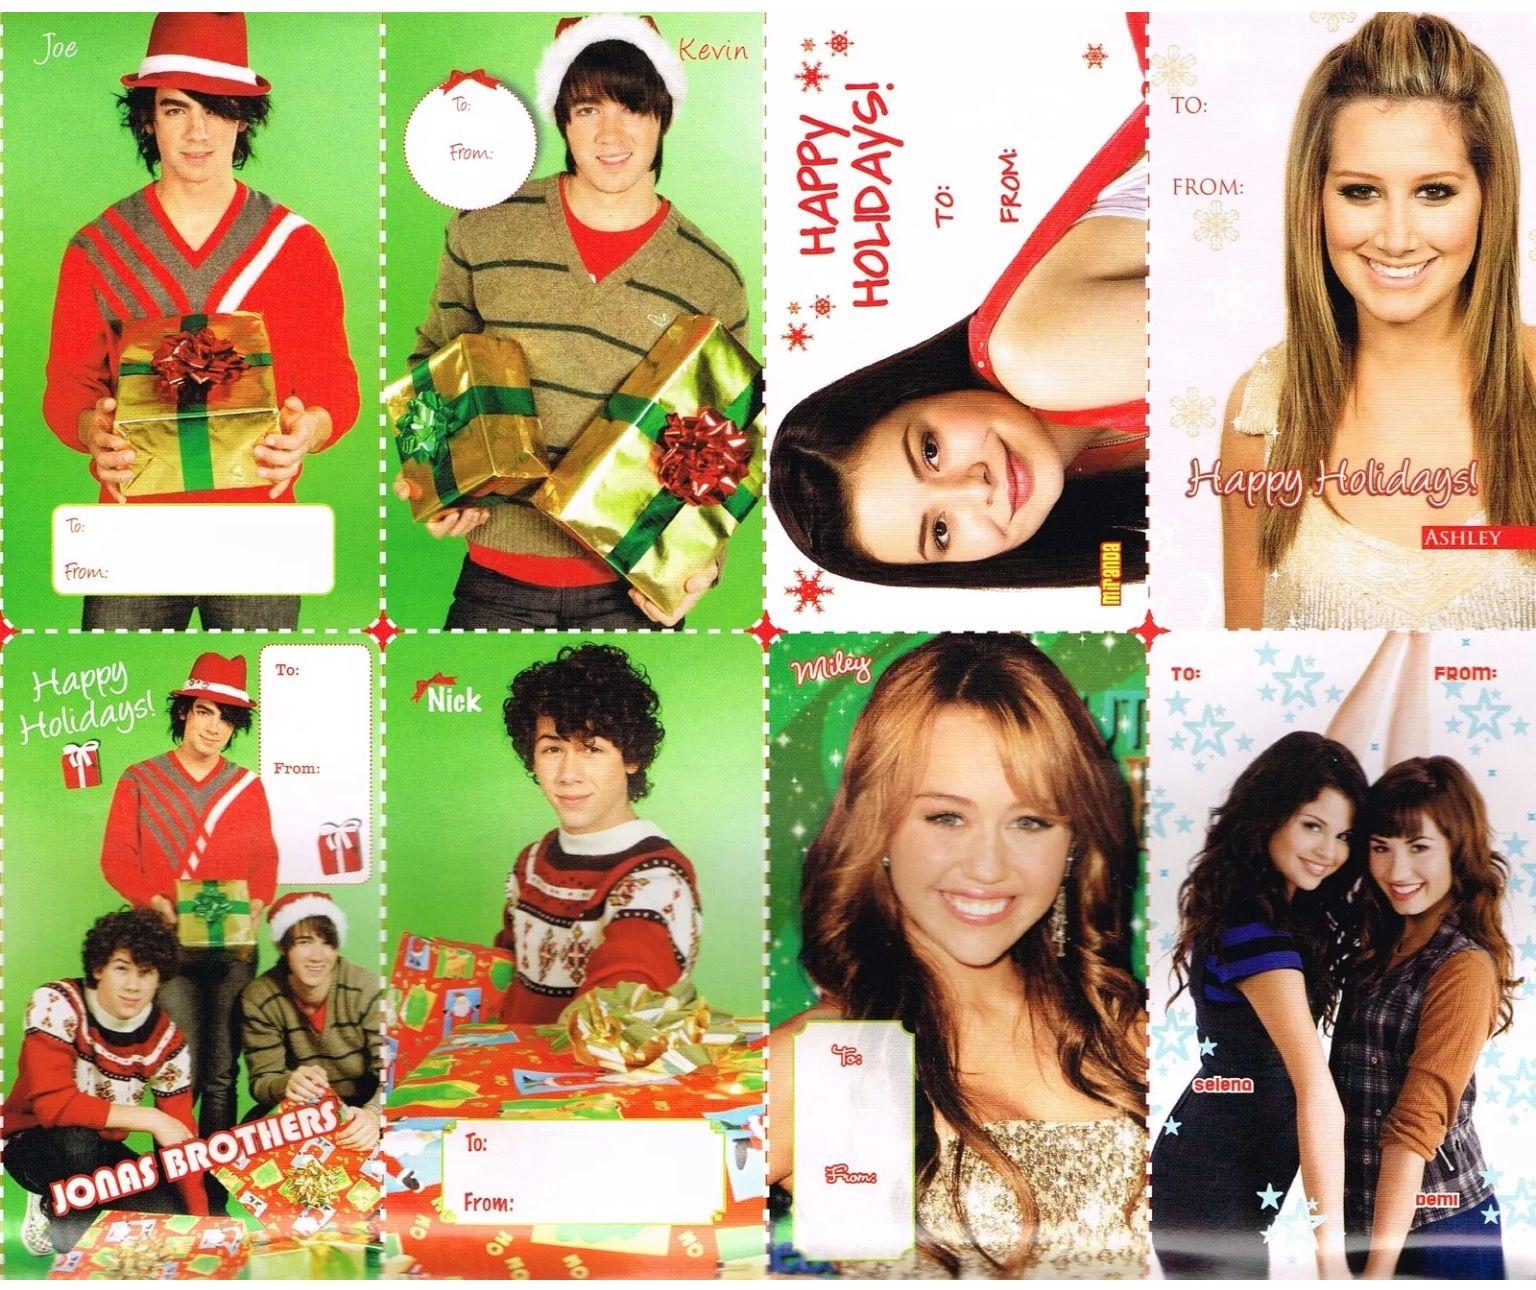 Joe Jonas Kevin Jonas Miranda Cosgrove Ashley Tisdale Nick Jonas Miley Cyrus Selena Gomez And De Selena Gomez Miley Cyrus Miranda Cosgrove Miley Cyrus